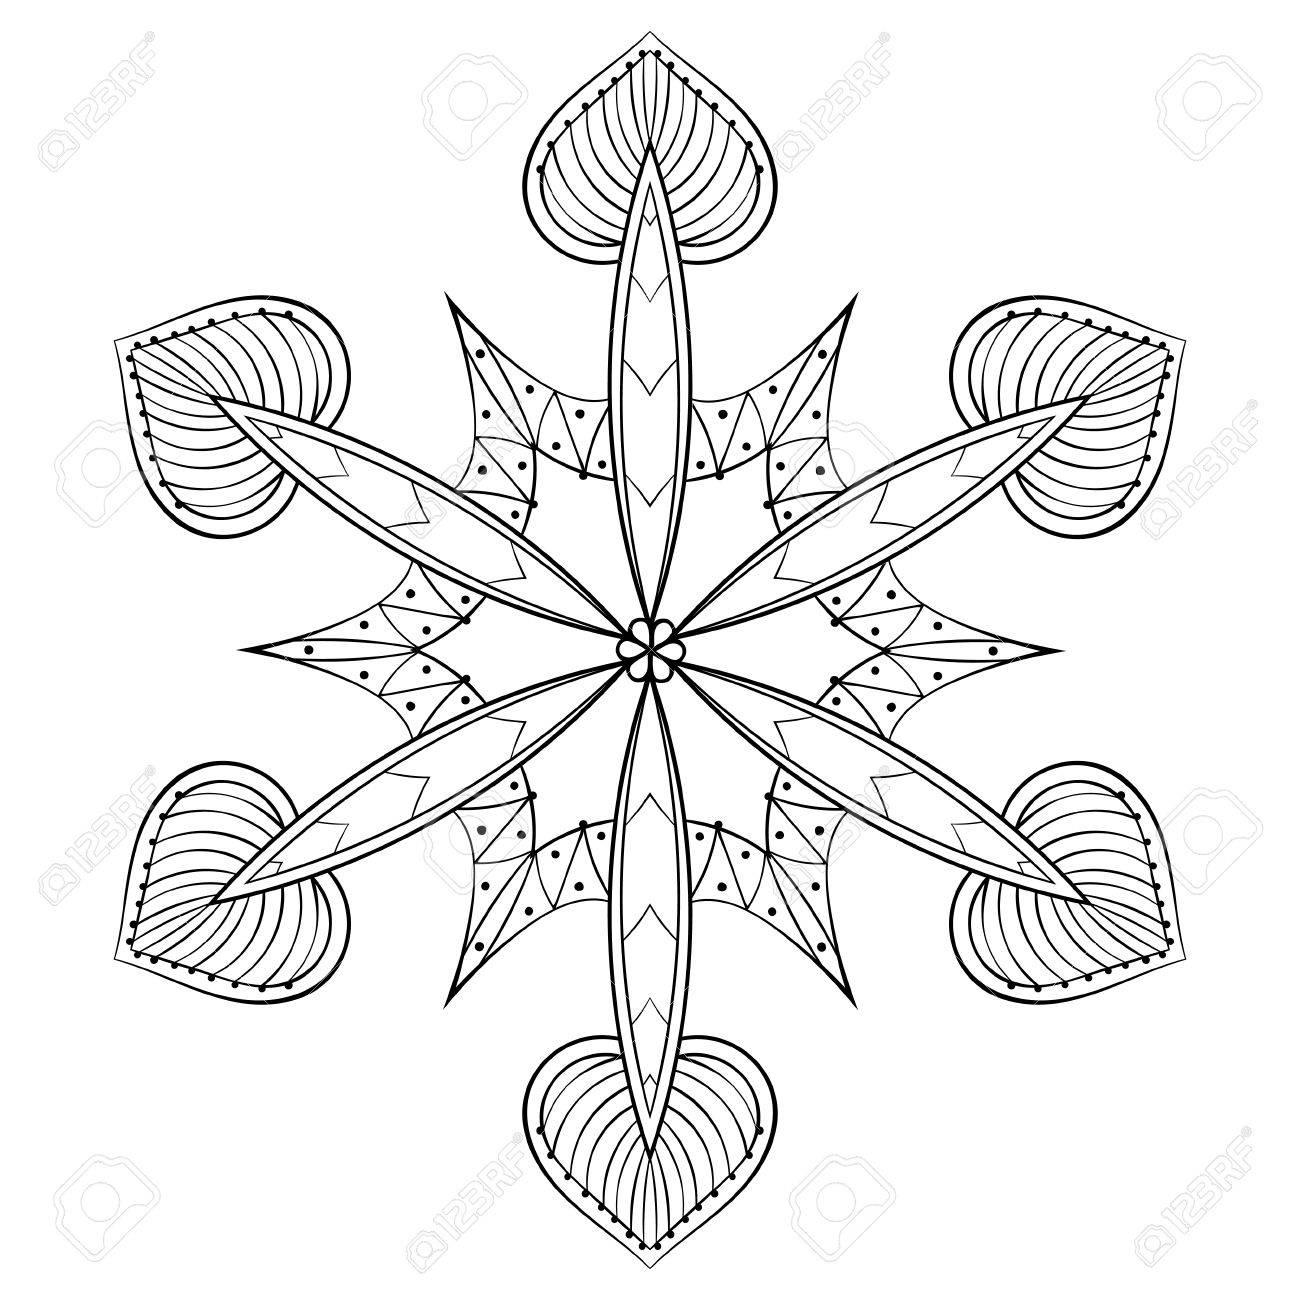 Zentangle Vector De Copos De Nieve Elegante, Mandala Para Colorear ...